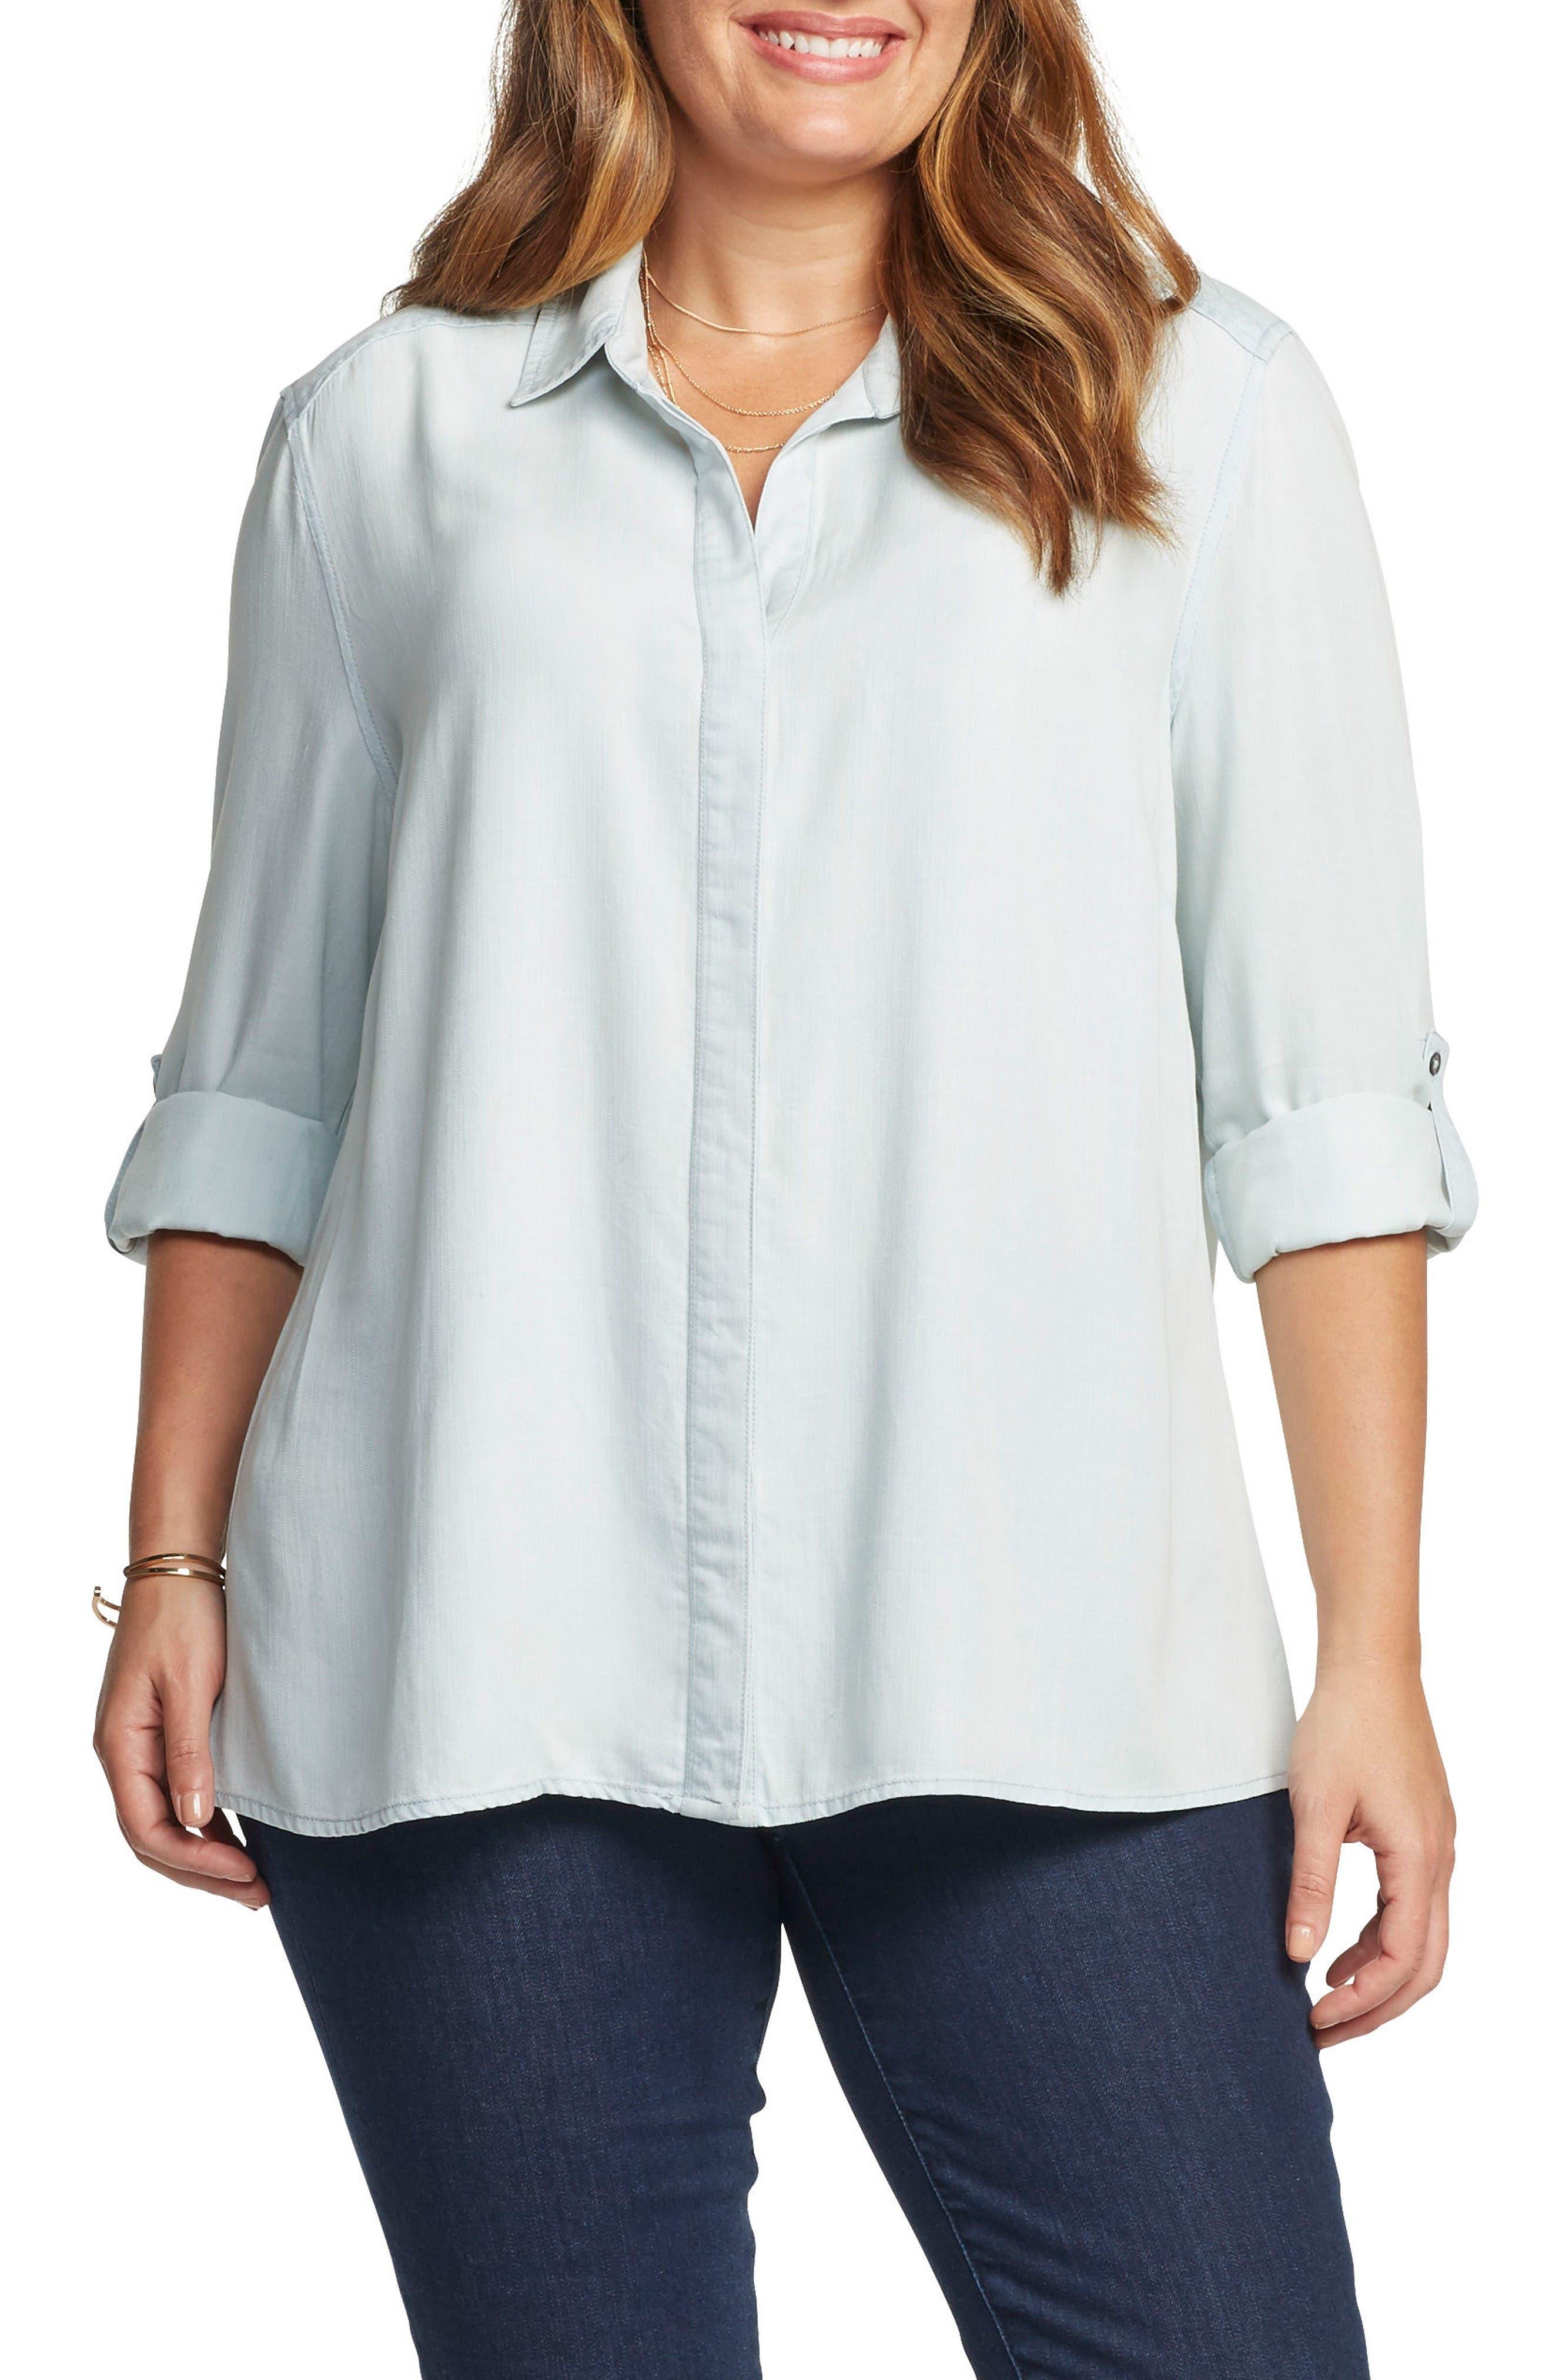 Caroline Roll Sleeve Top,                         Main,                         color, Light Blue